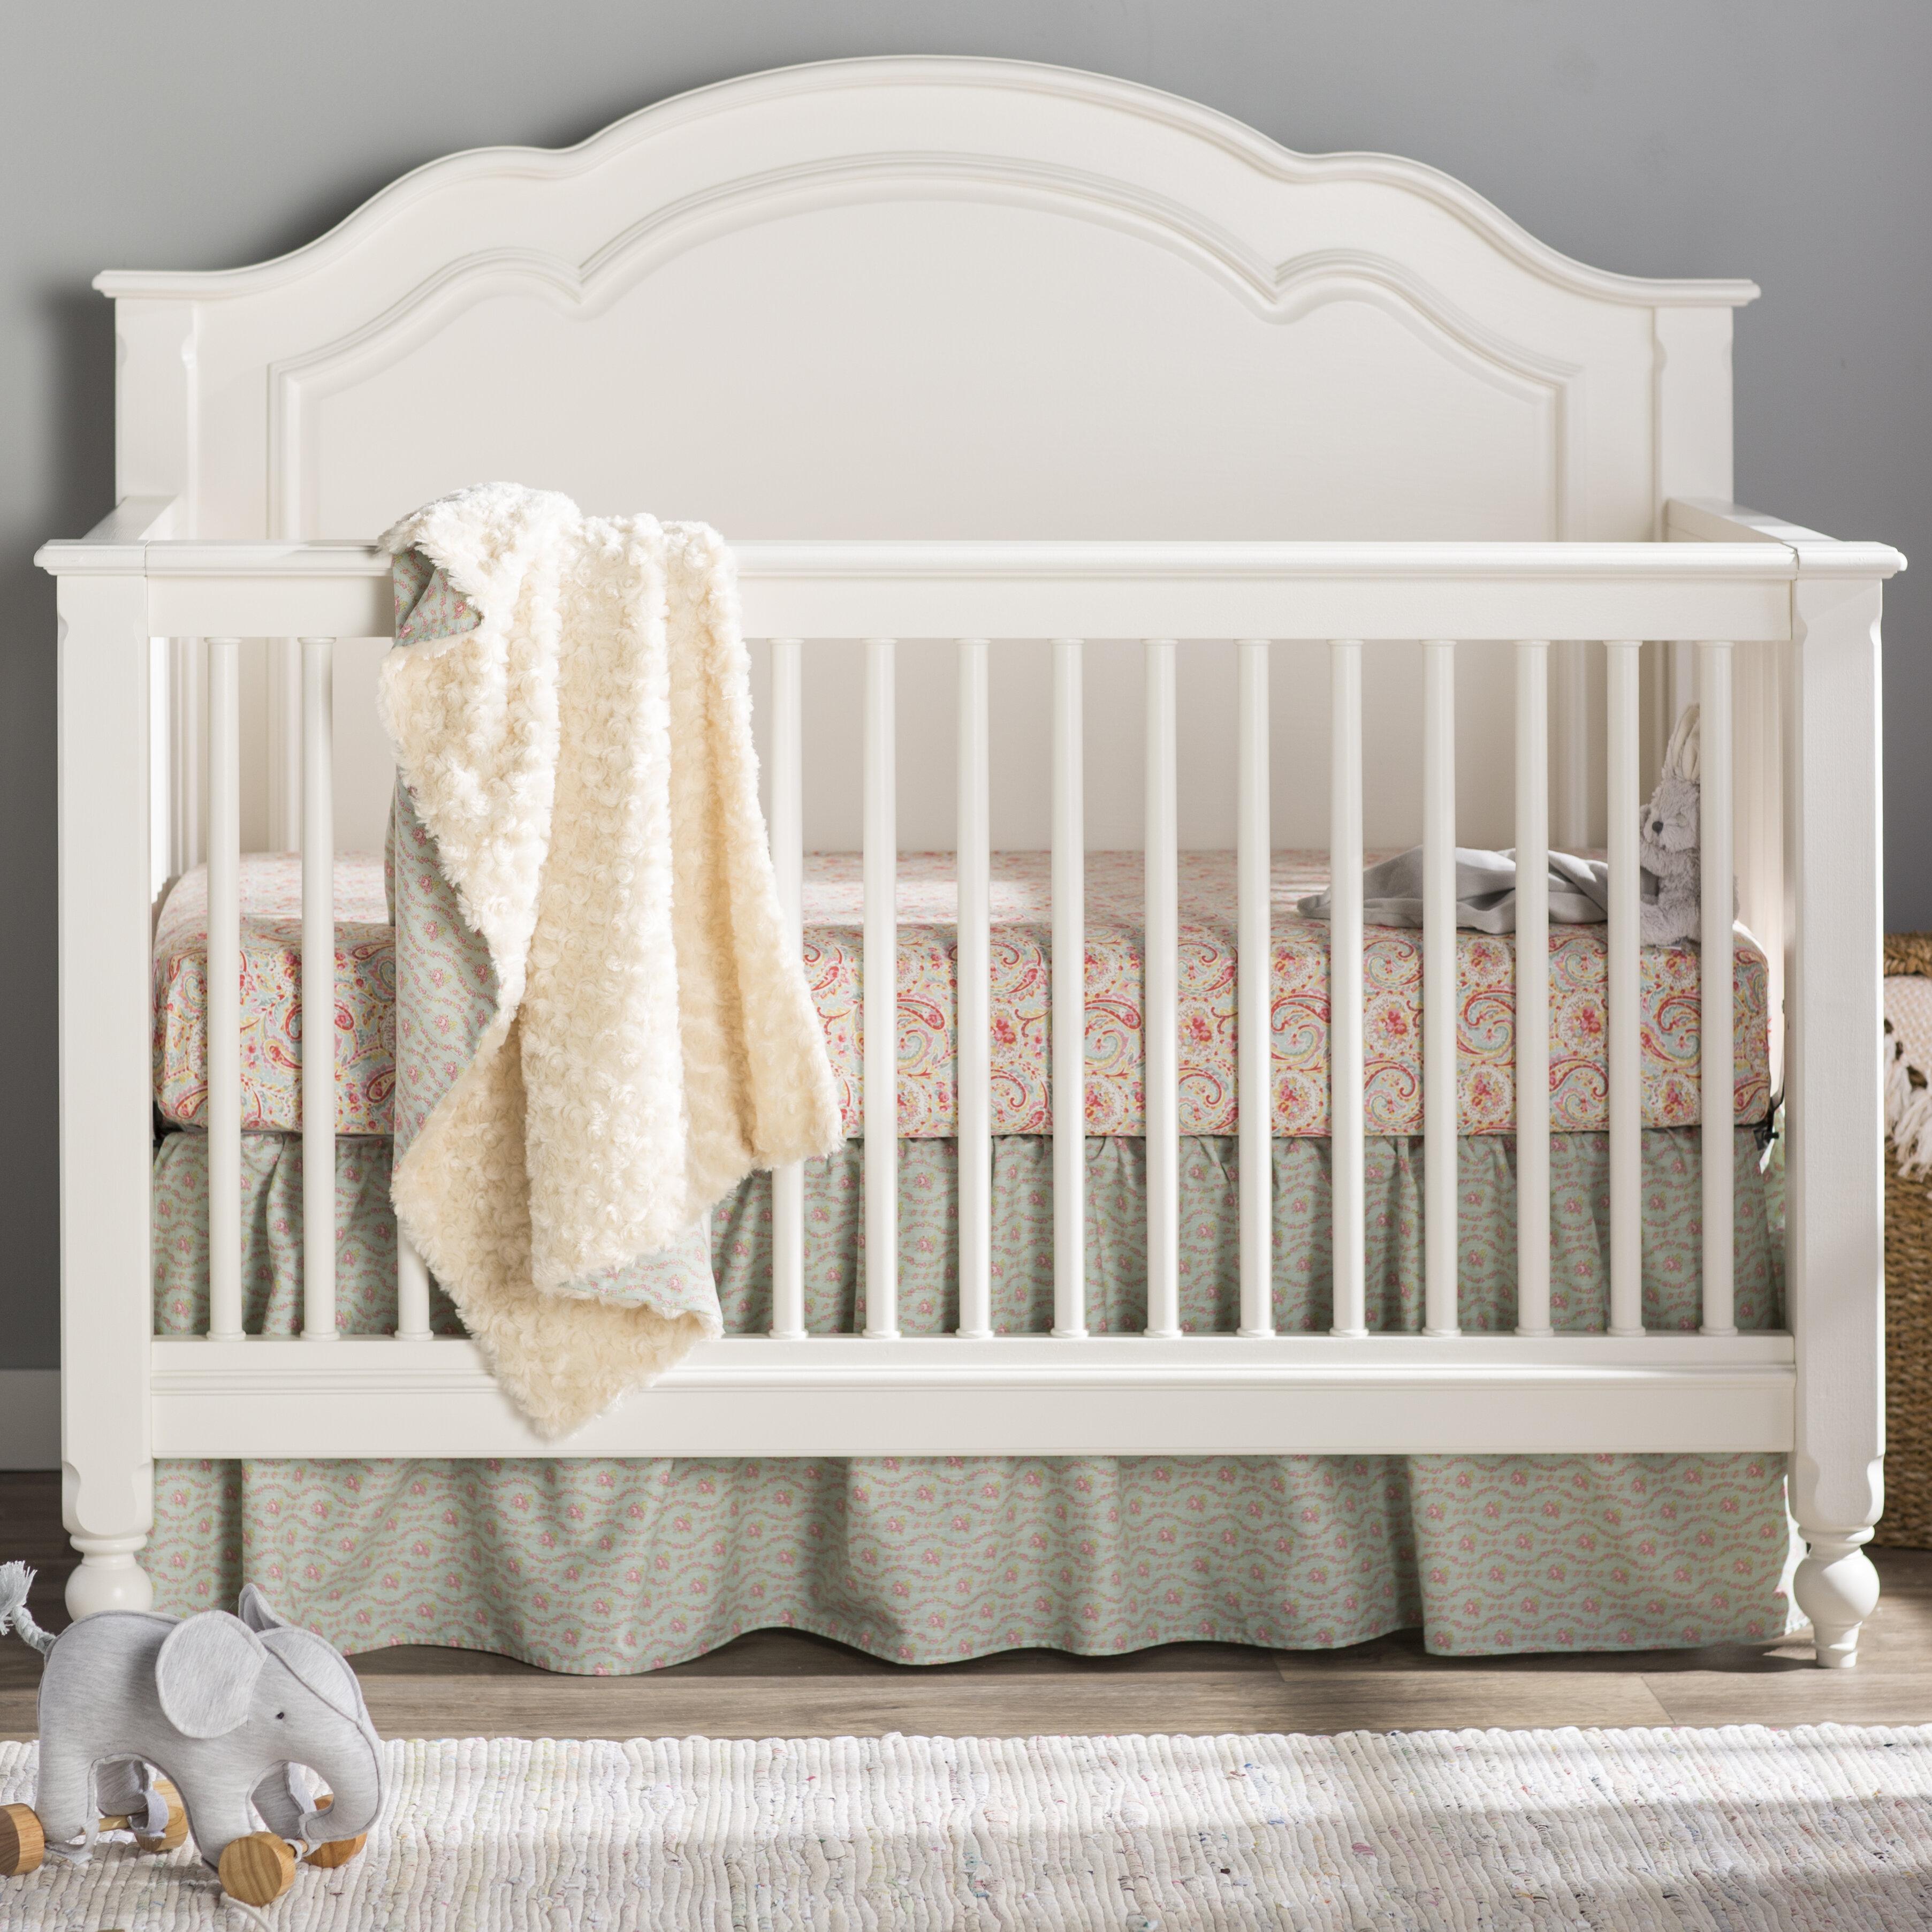 Harriet Bee Glastbury 3 Piece Crib Bedding Set Reviews Wayfair